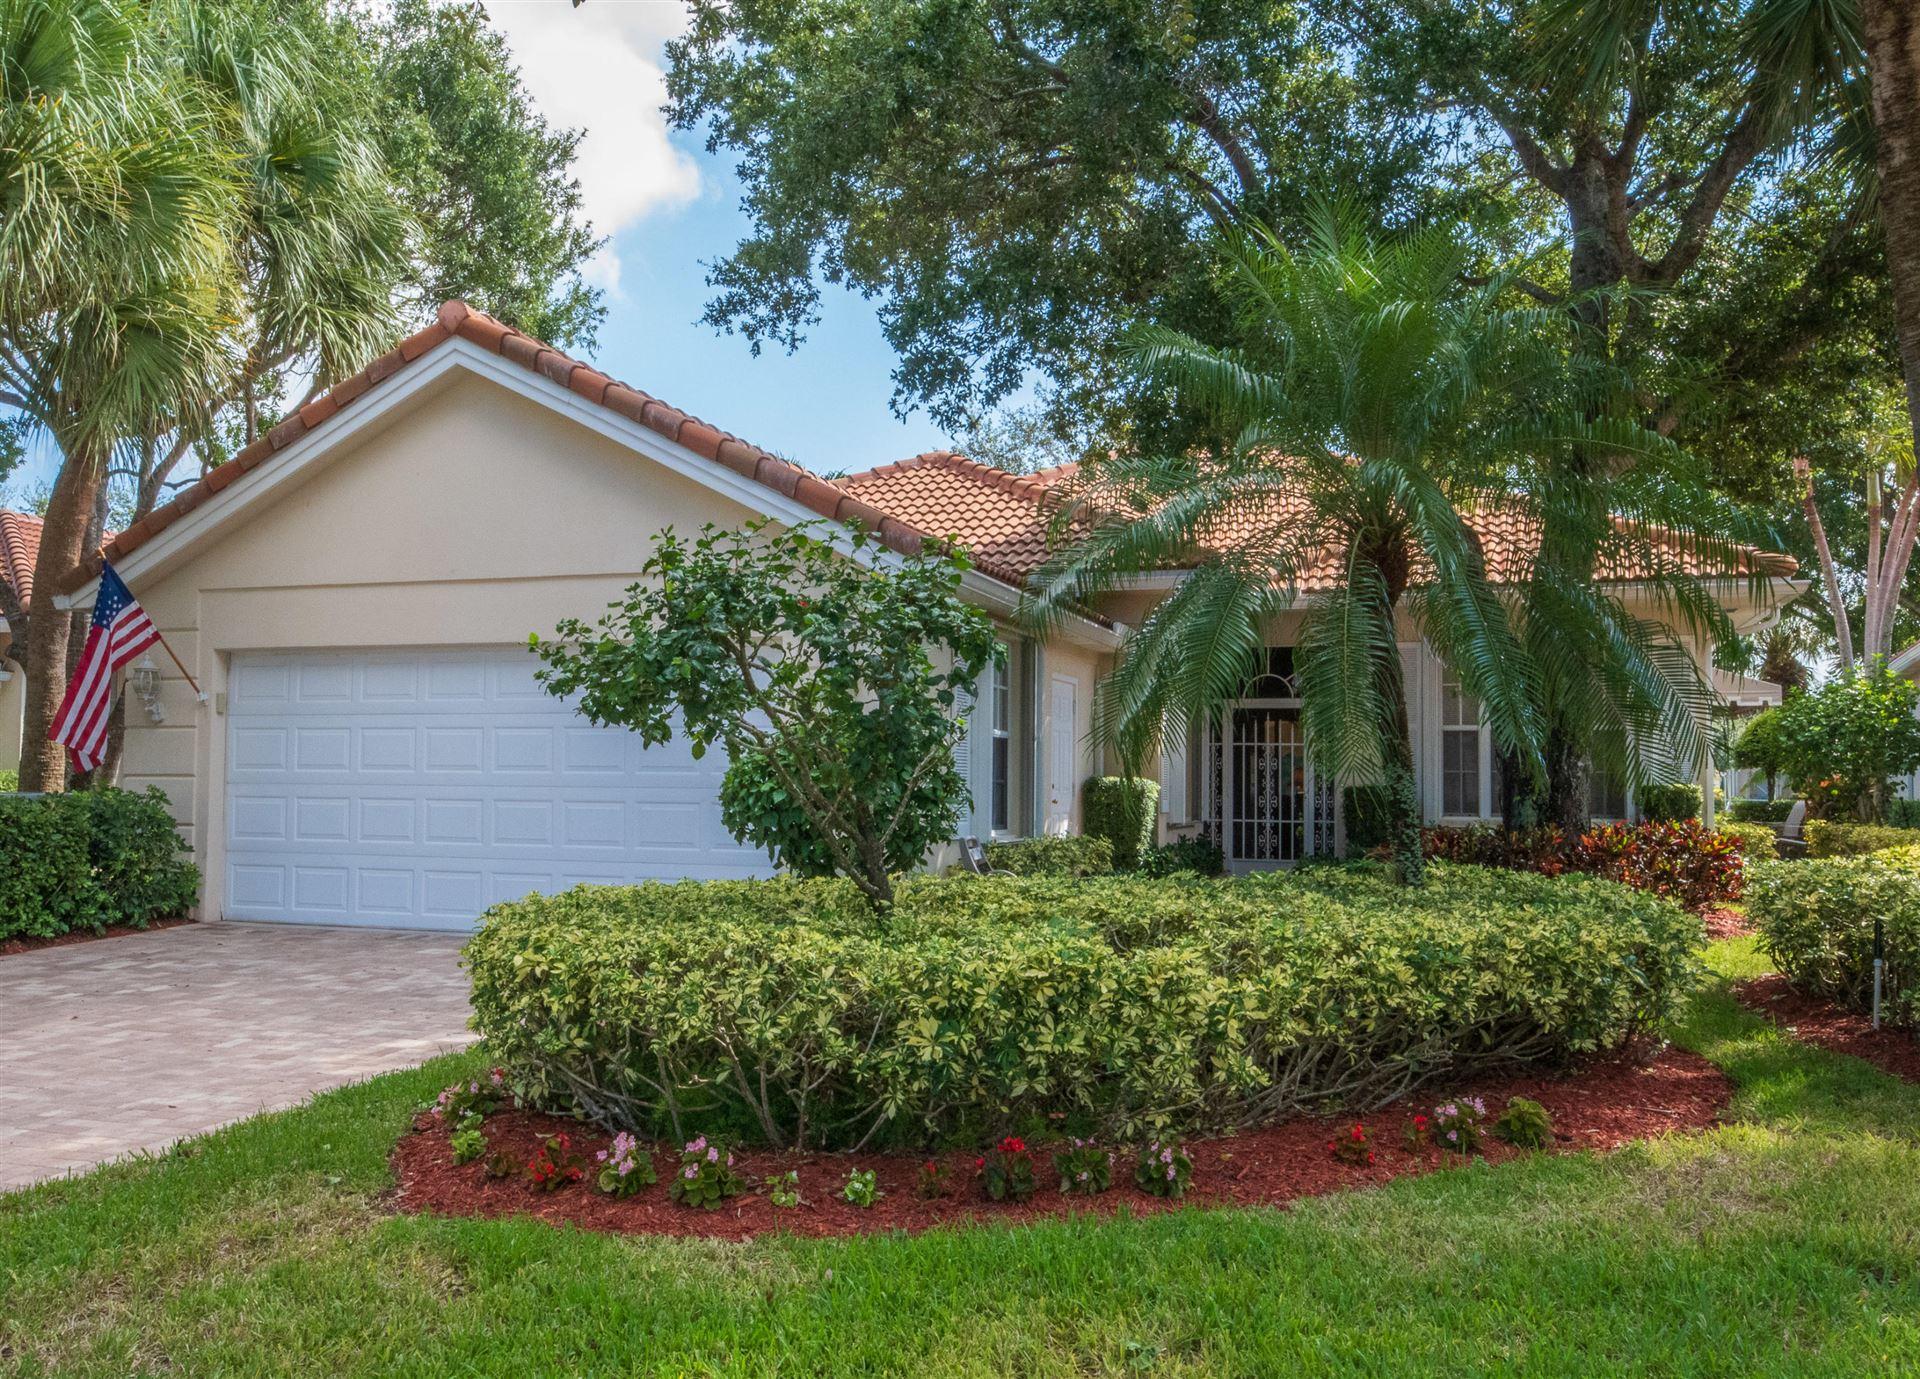 612 Rosa Court, Palm Beach Gardens, FL 33410 - #: RX-10657408